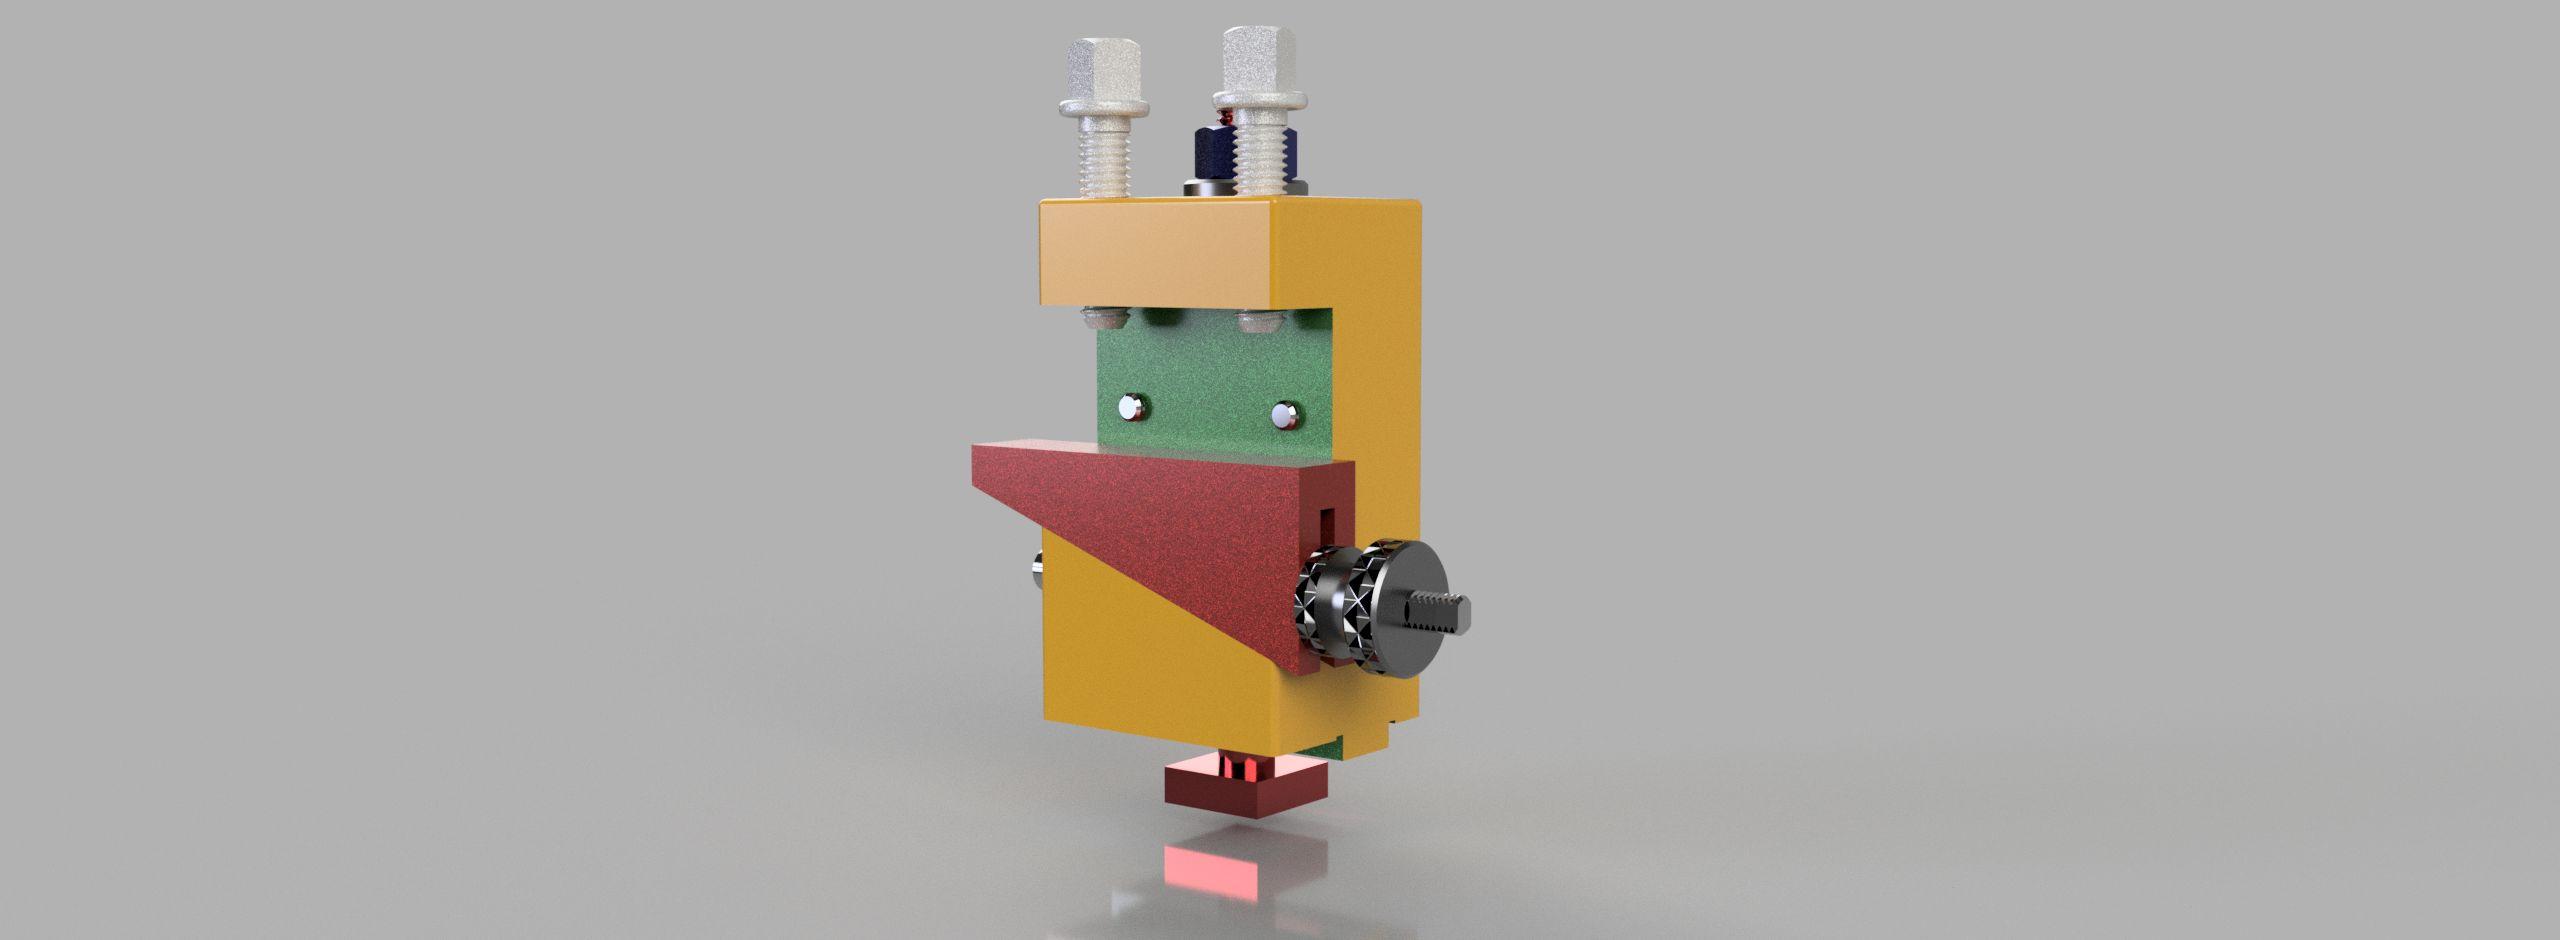 Tool-post-v13-b-3500-3500